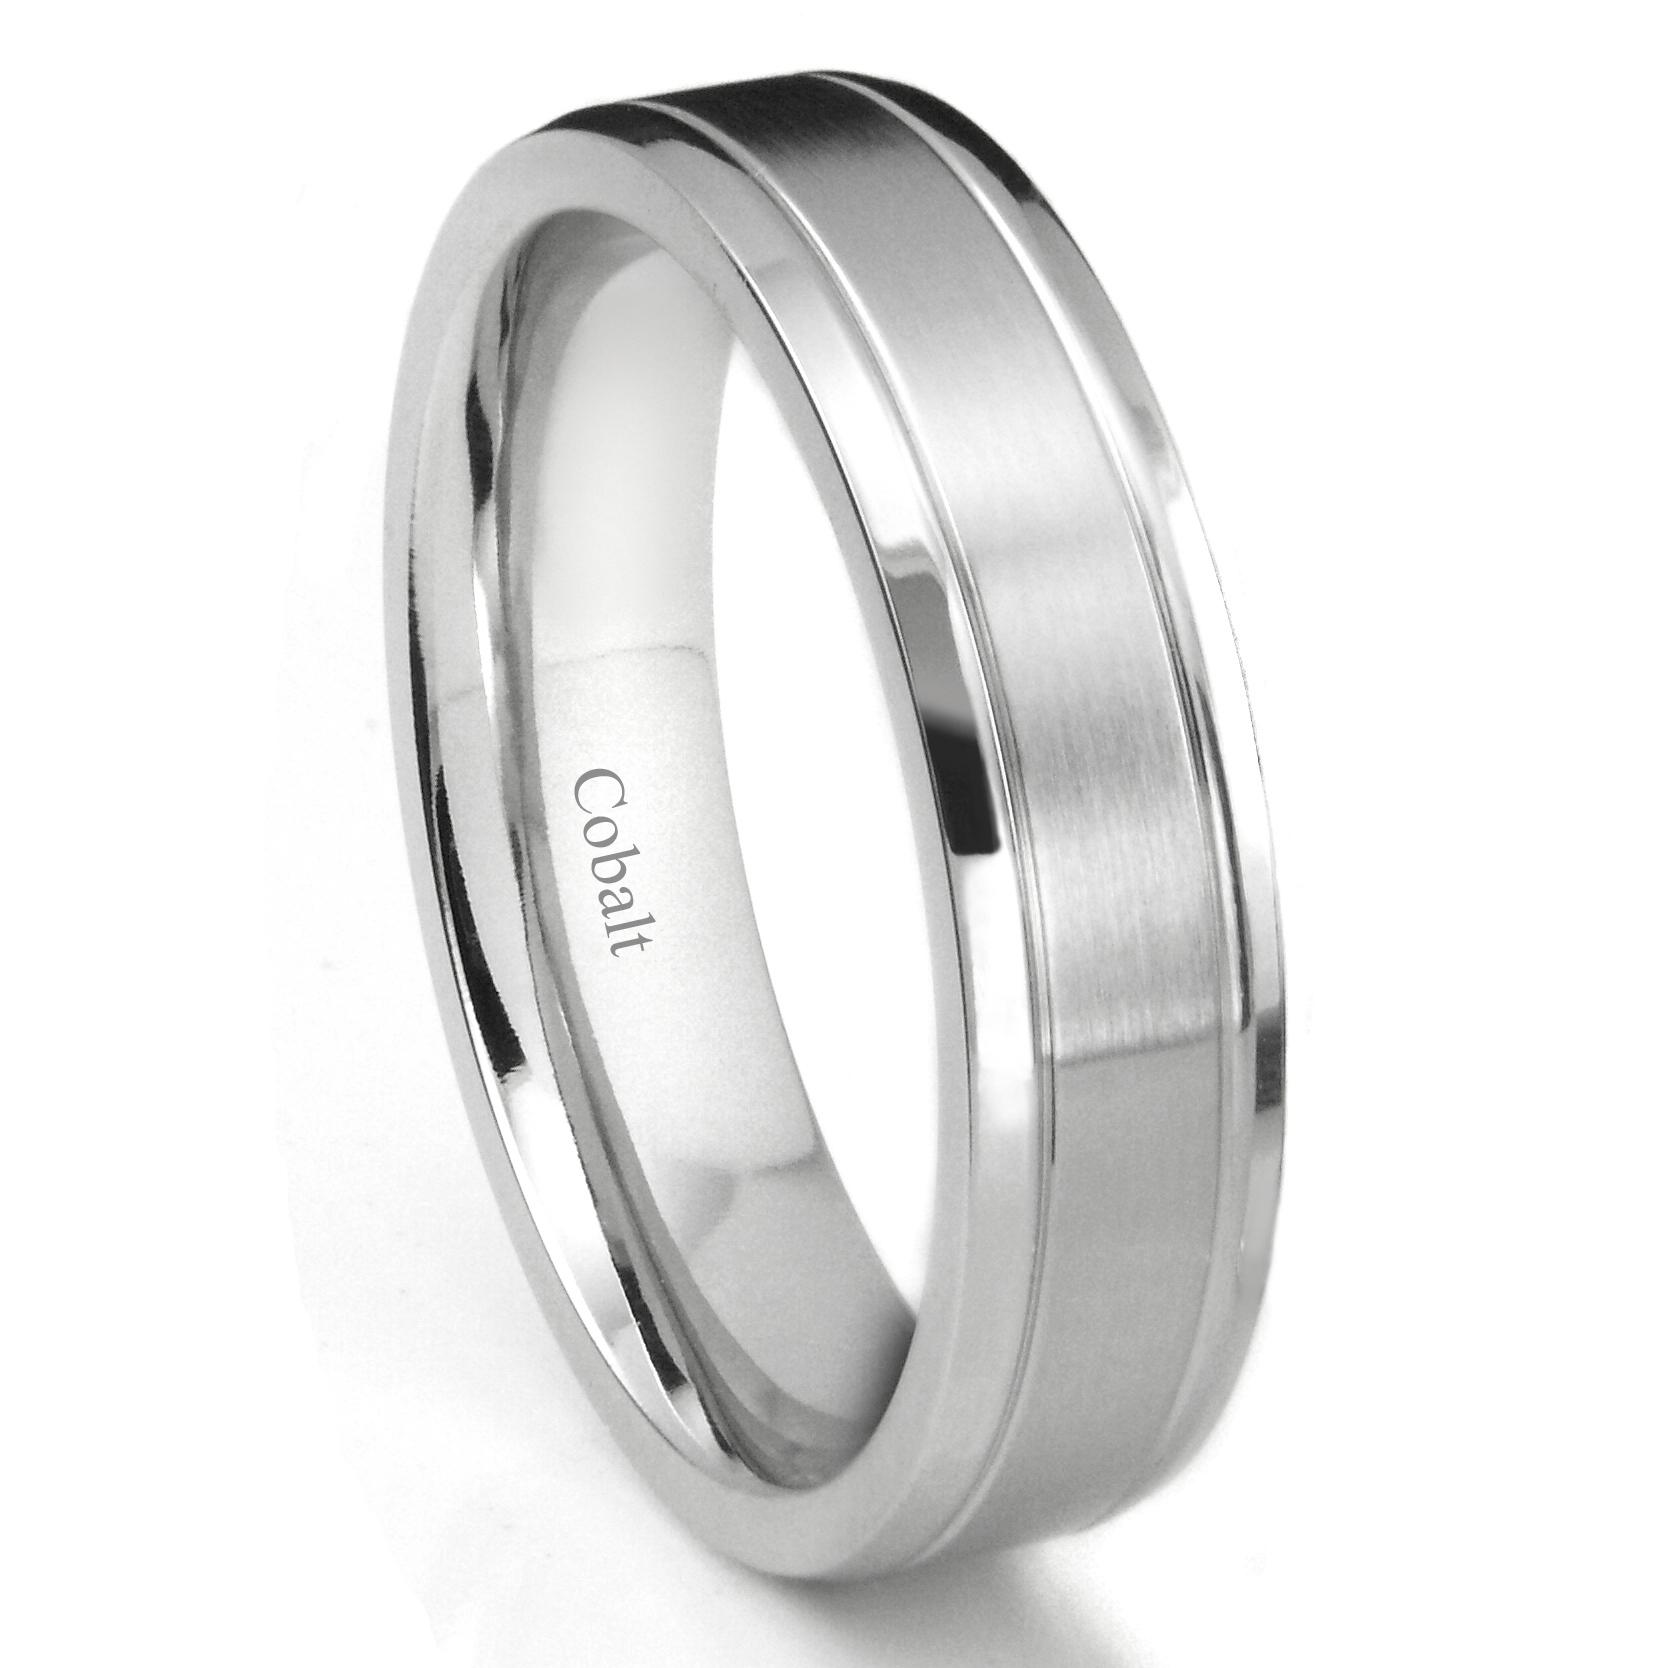 Cobalt XF Chrome 6MM Newport Beveled Wedding Band Ring